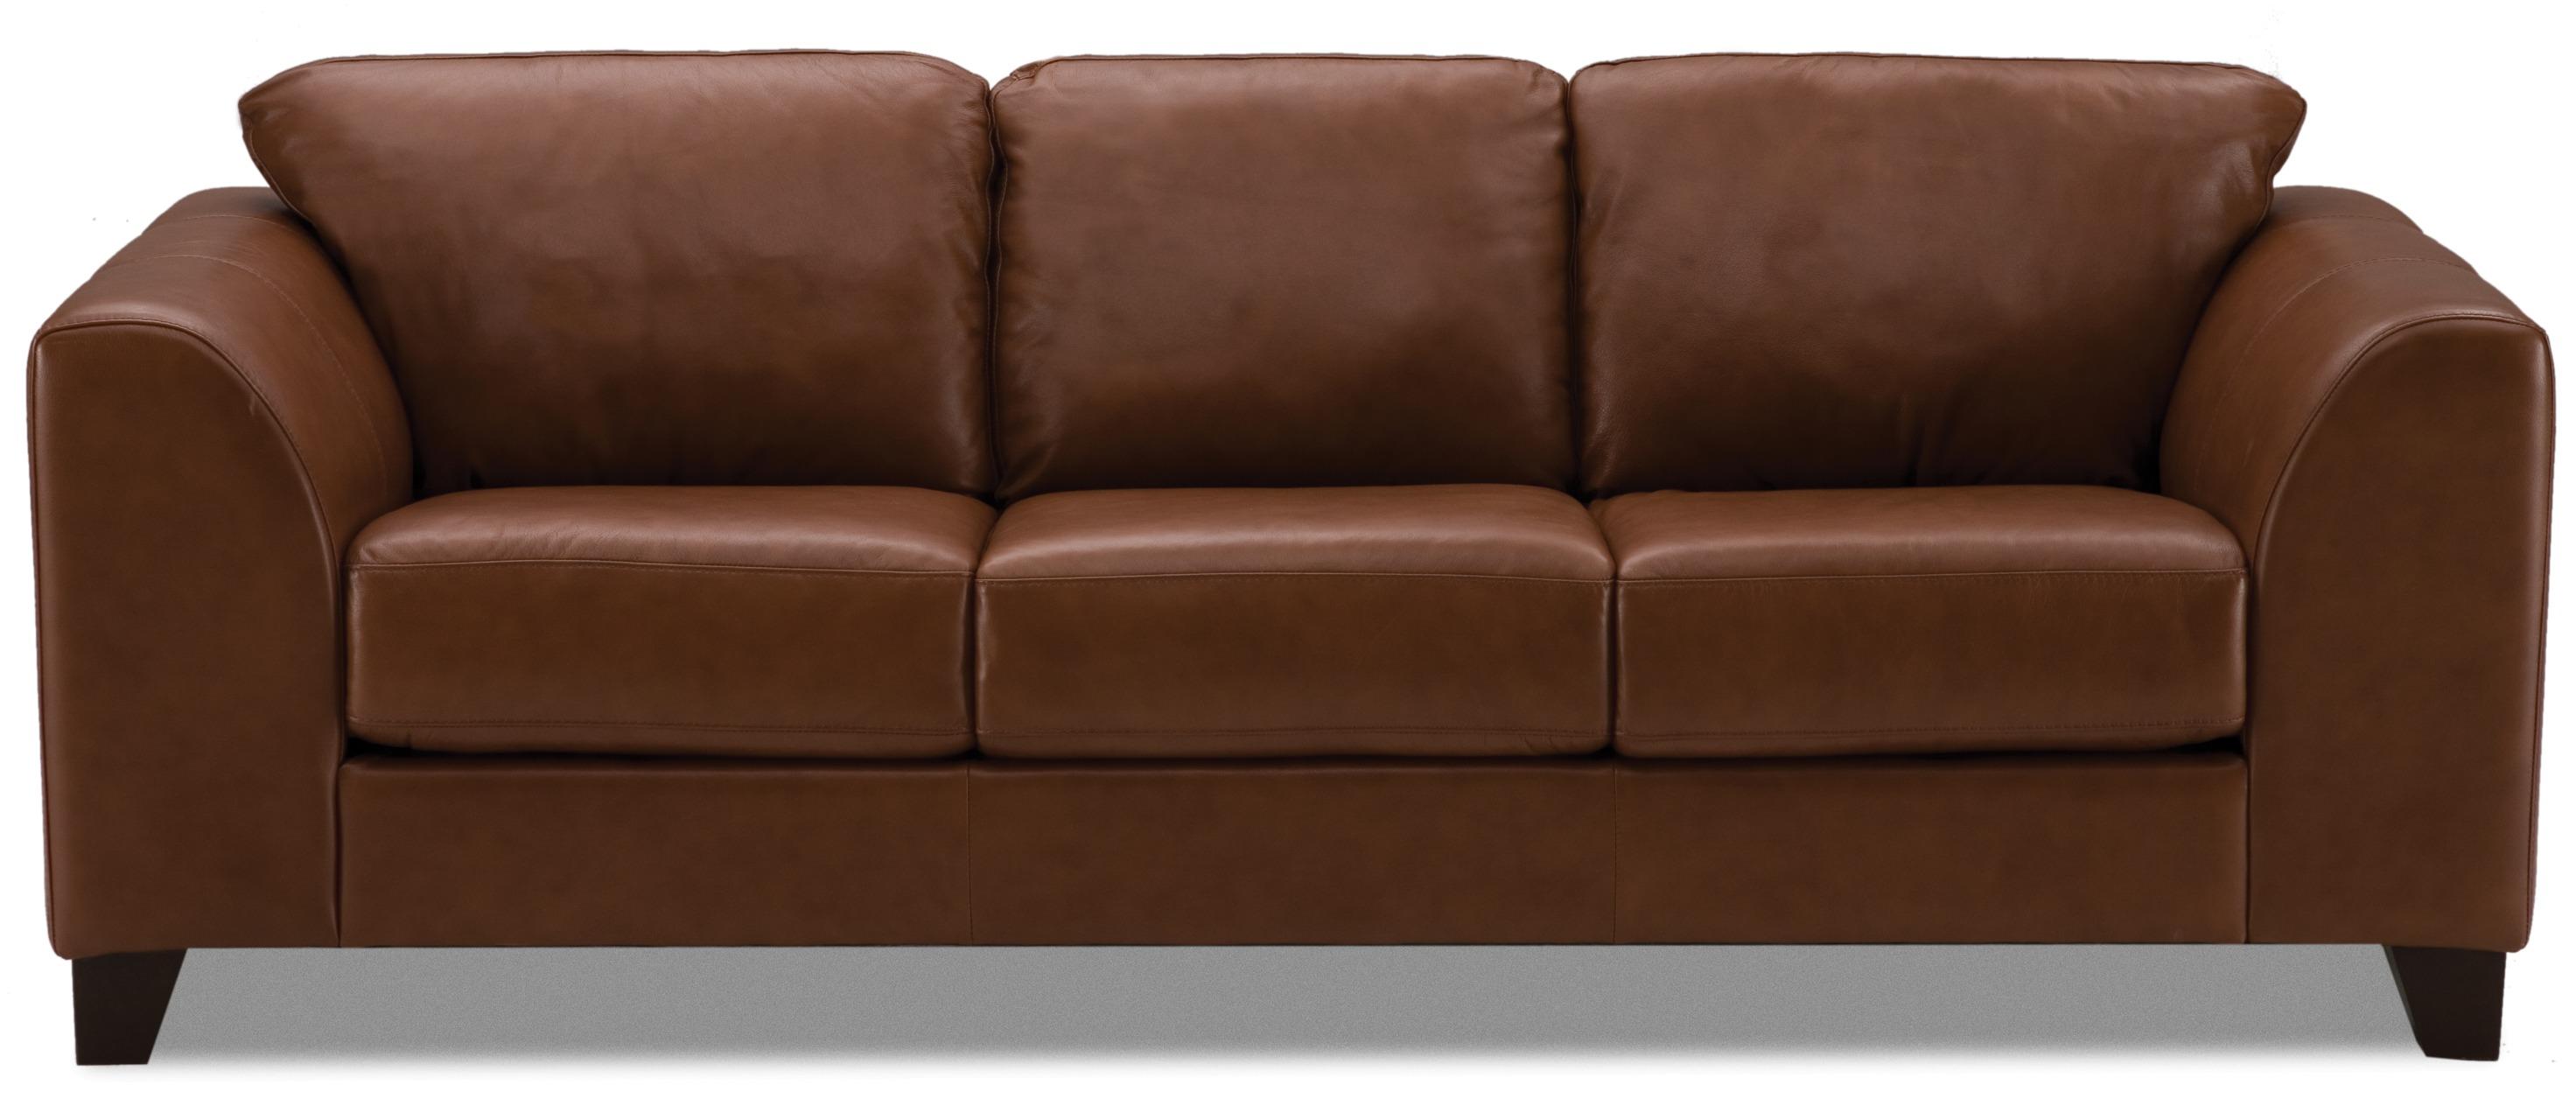 Juno Sofa Collection 450